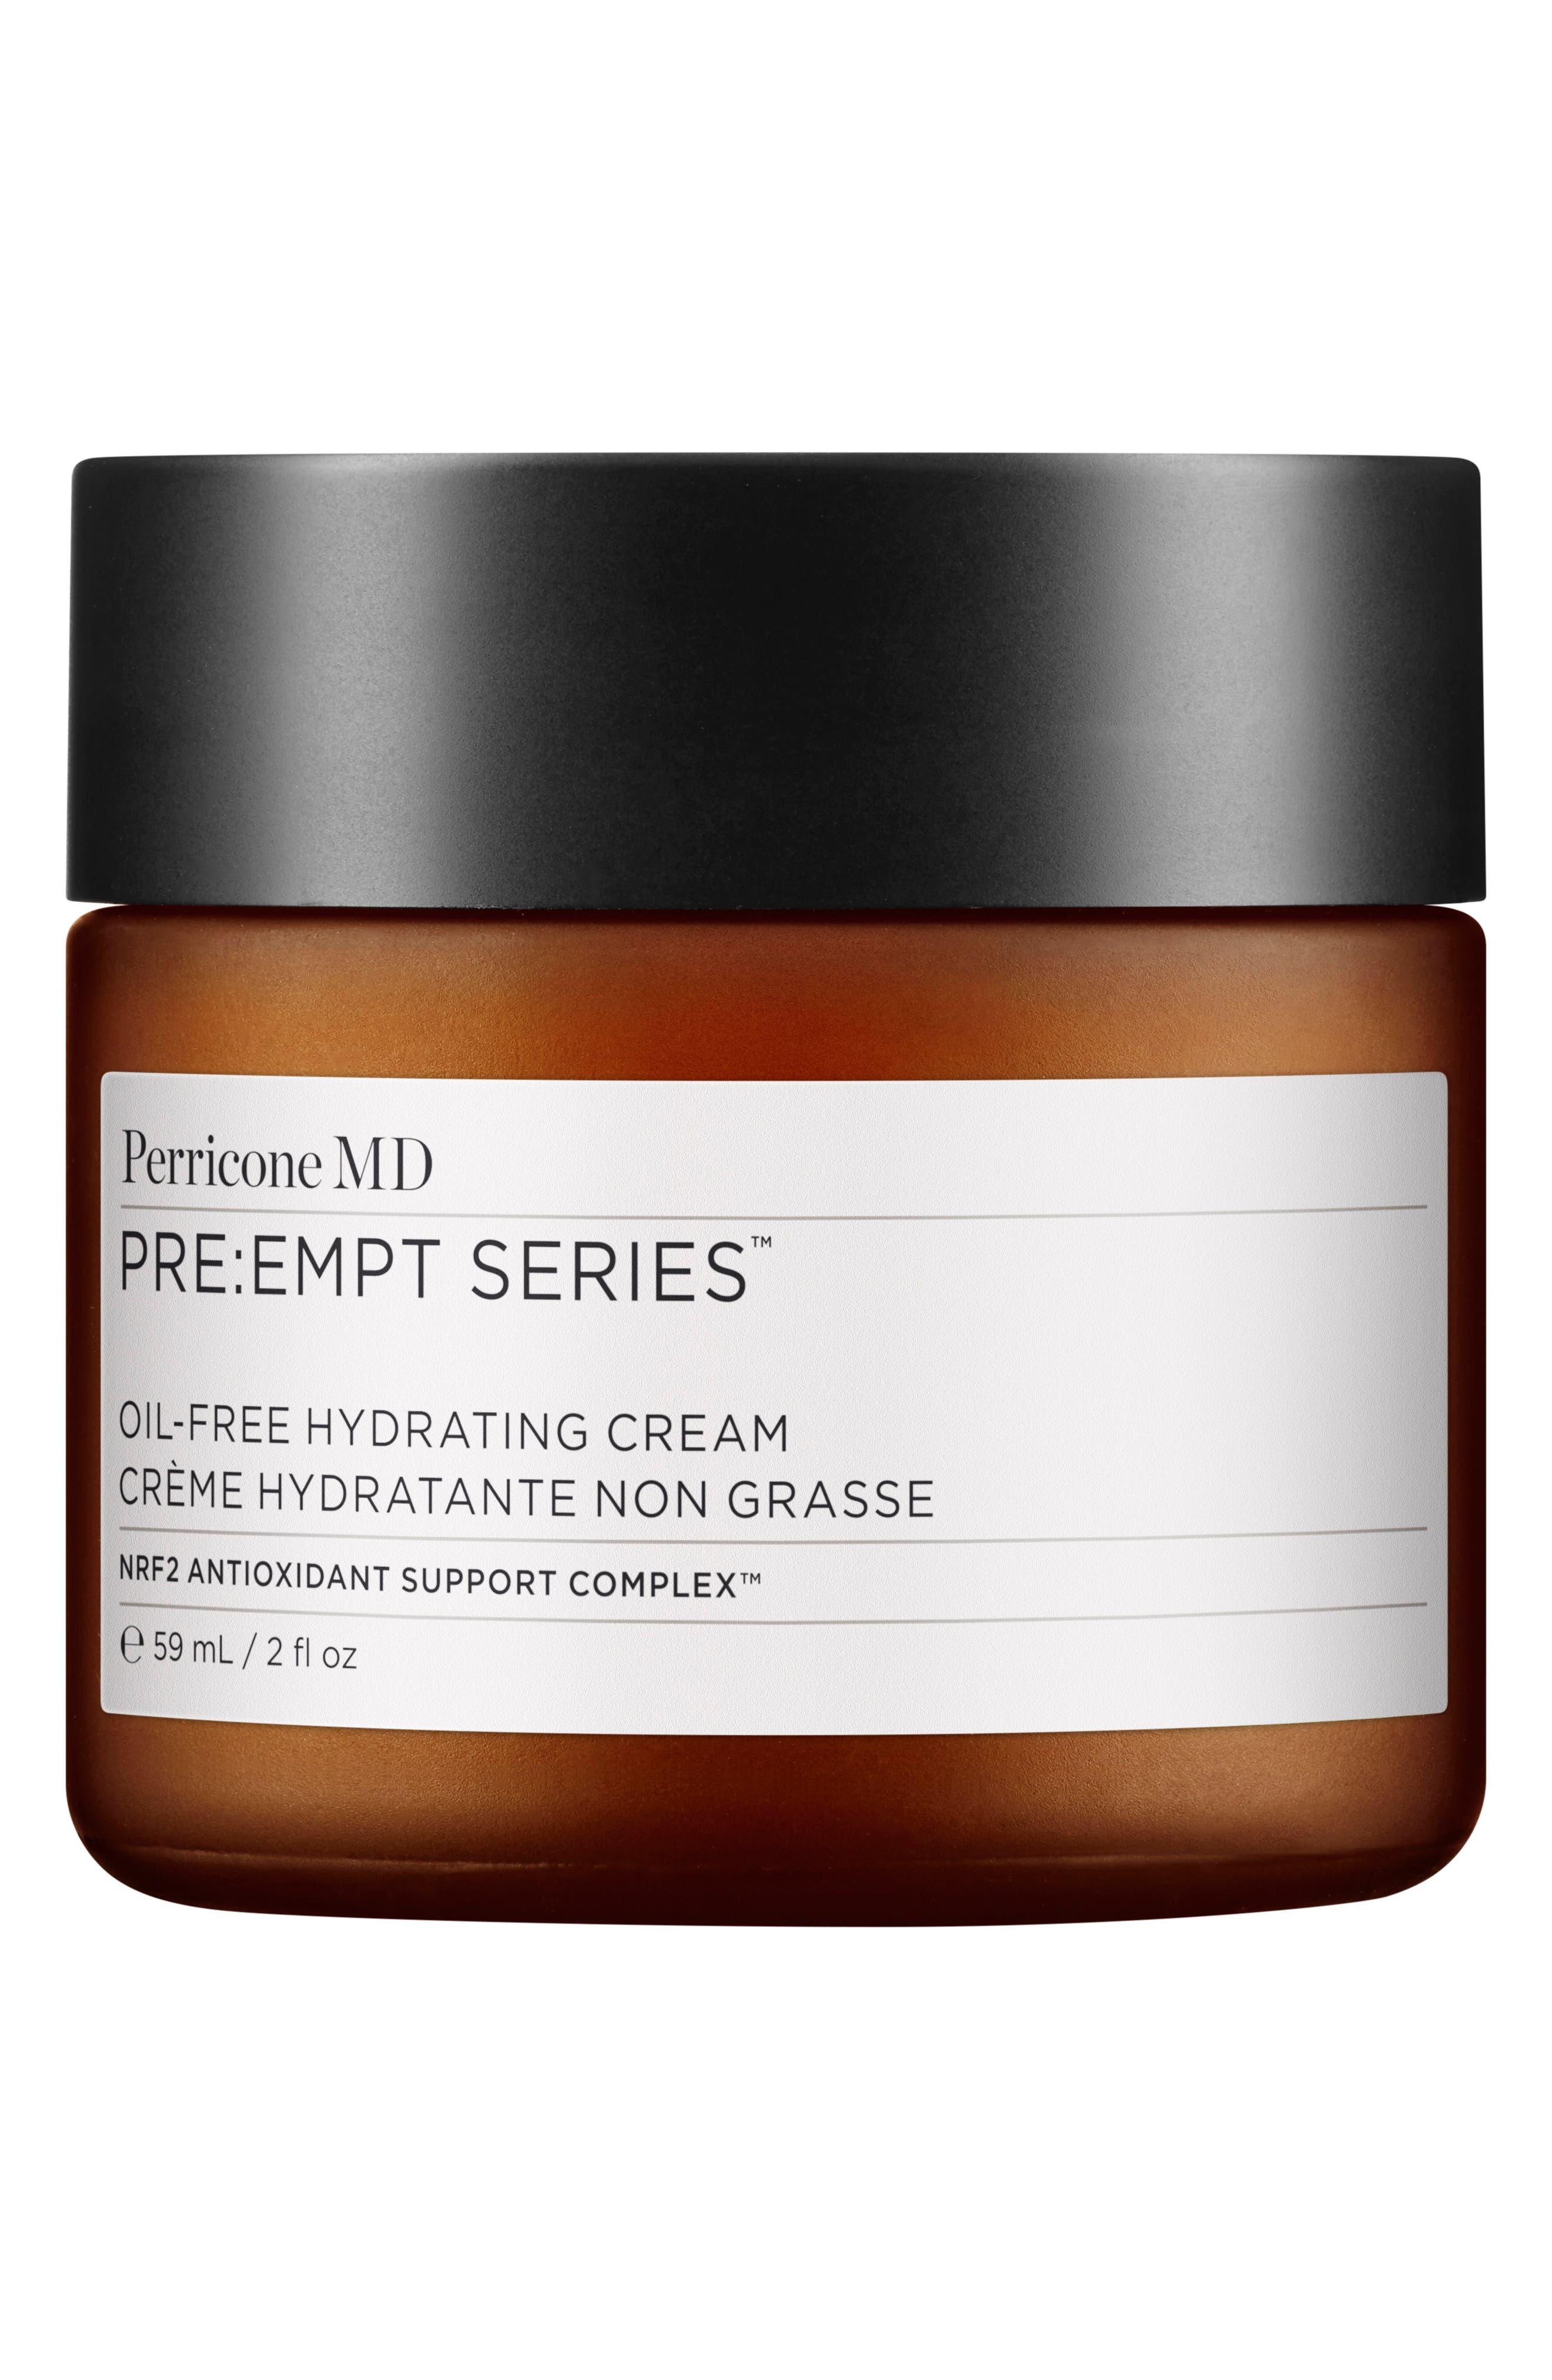 Perricone MD Pre-Empt Daily Brightening Moisturizer SPF 30